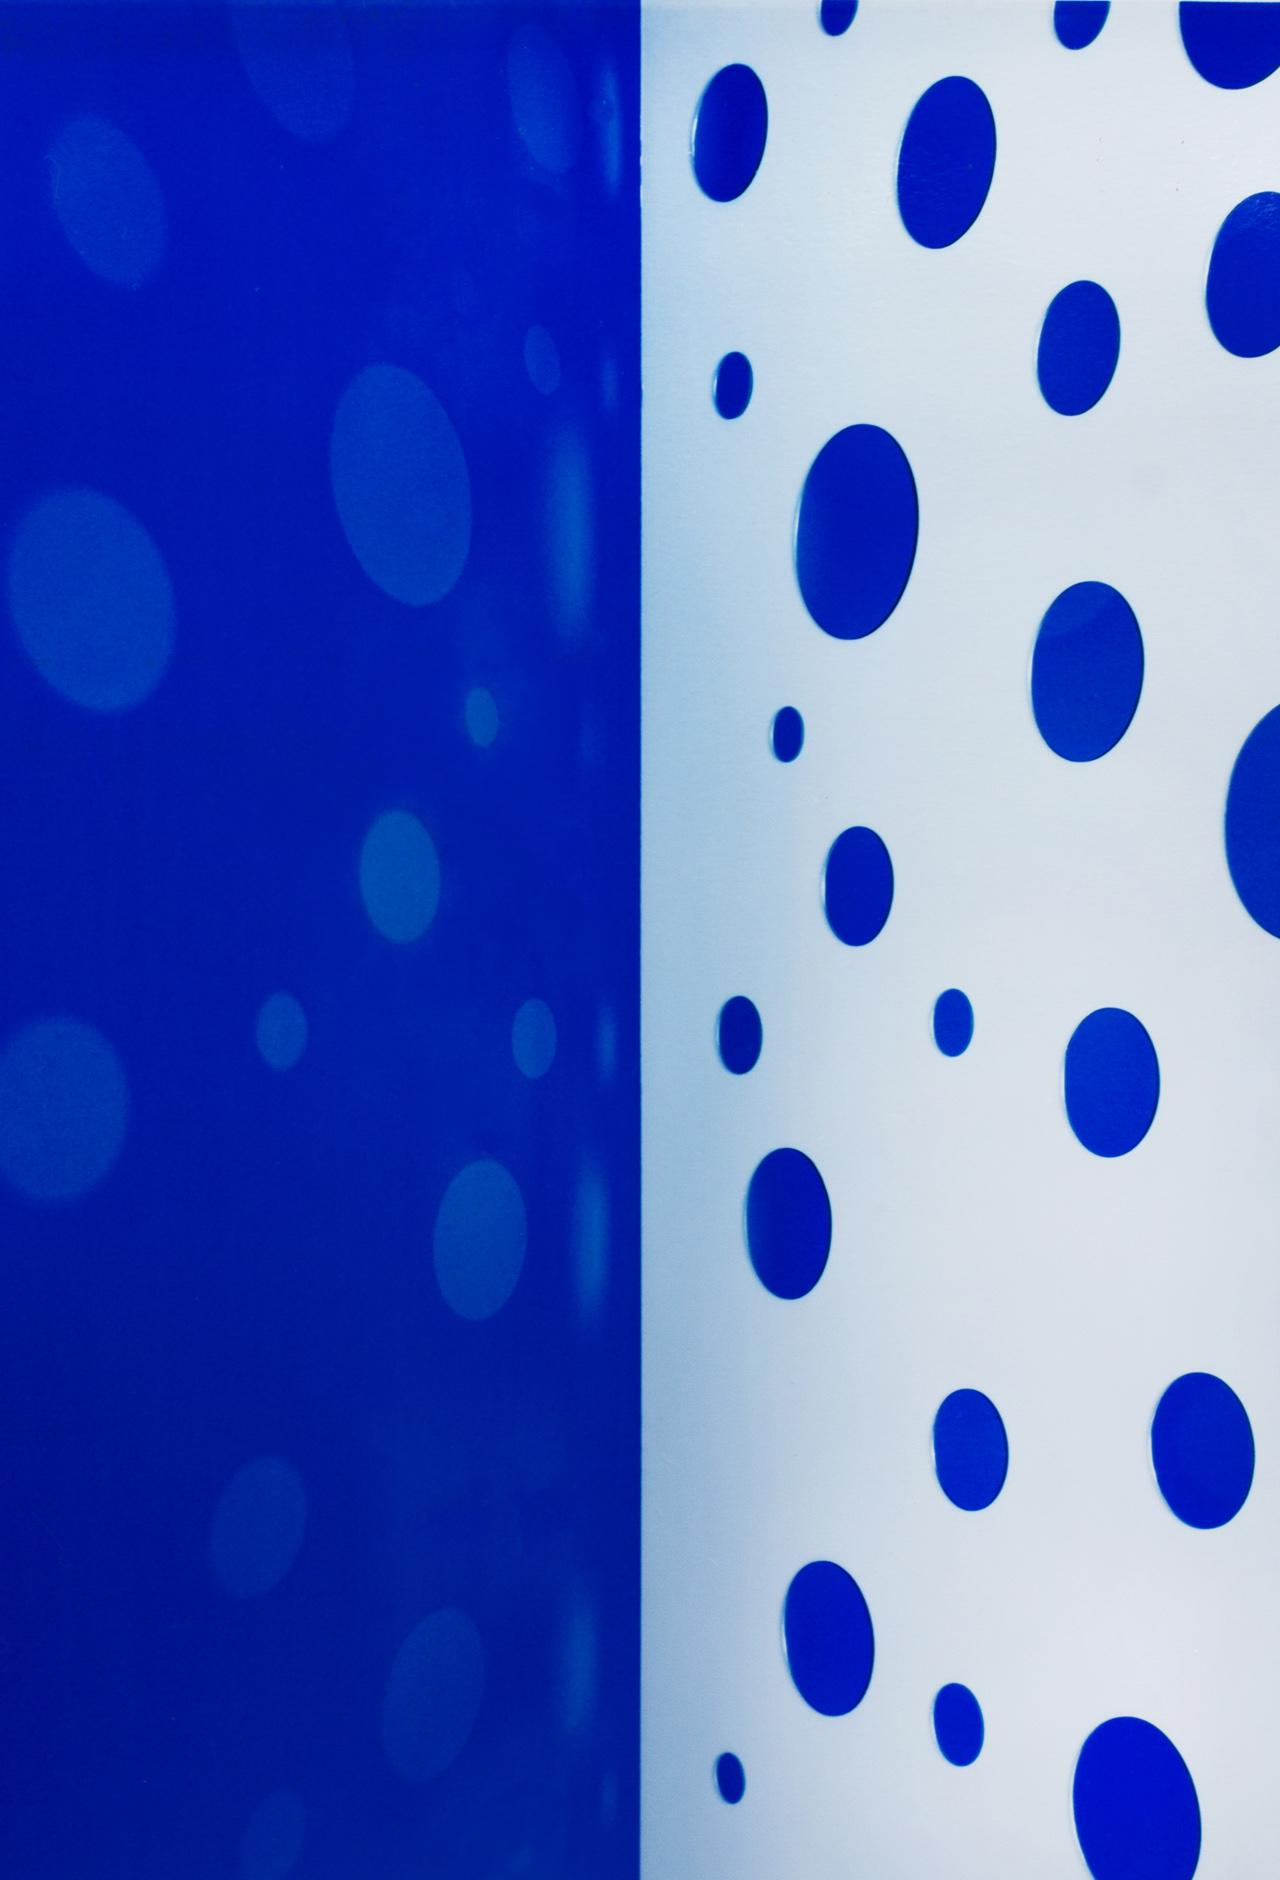 JACKY REDGATE   Light Throw (Mirrors) Fold - Blue and White  2019 Chromogenic photograph handprinted 185 x 127 cm